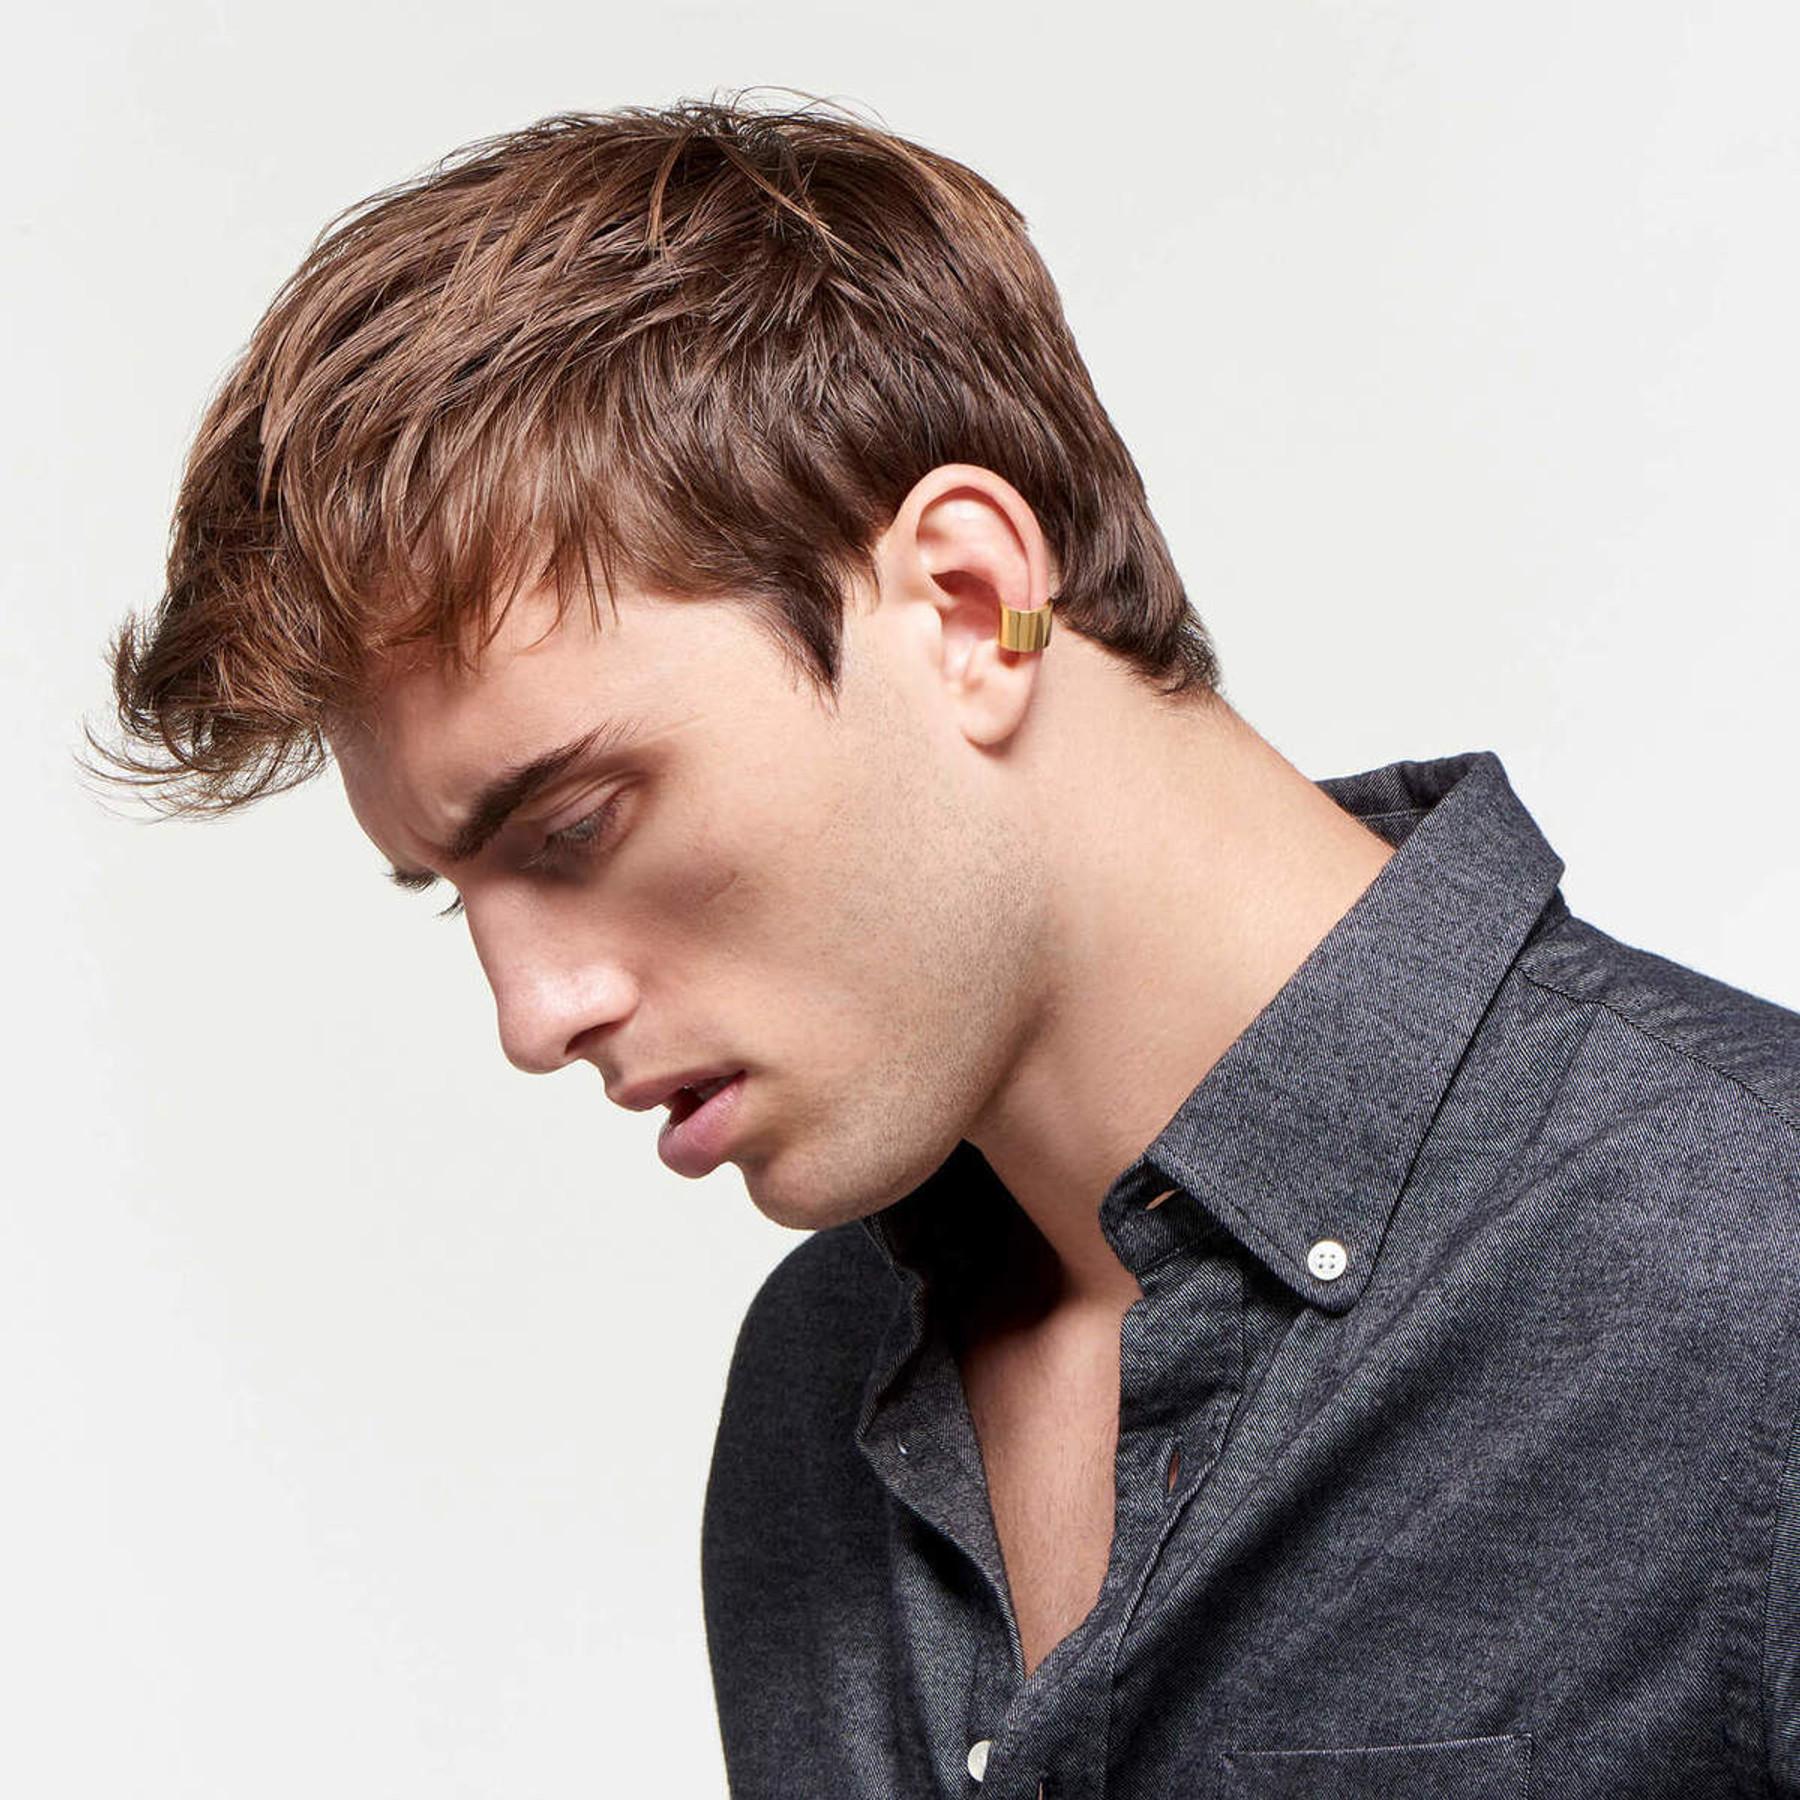 dashing male model wearing glimmering ear cuff of 22 karat polished gold